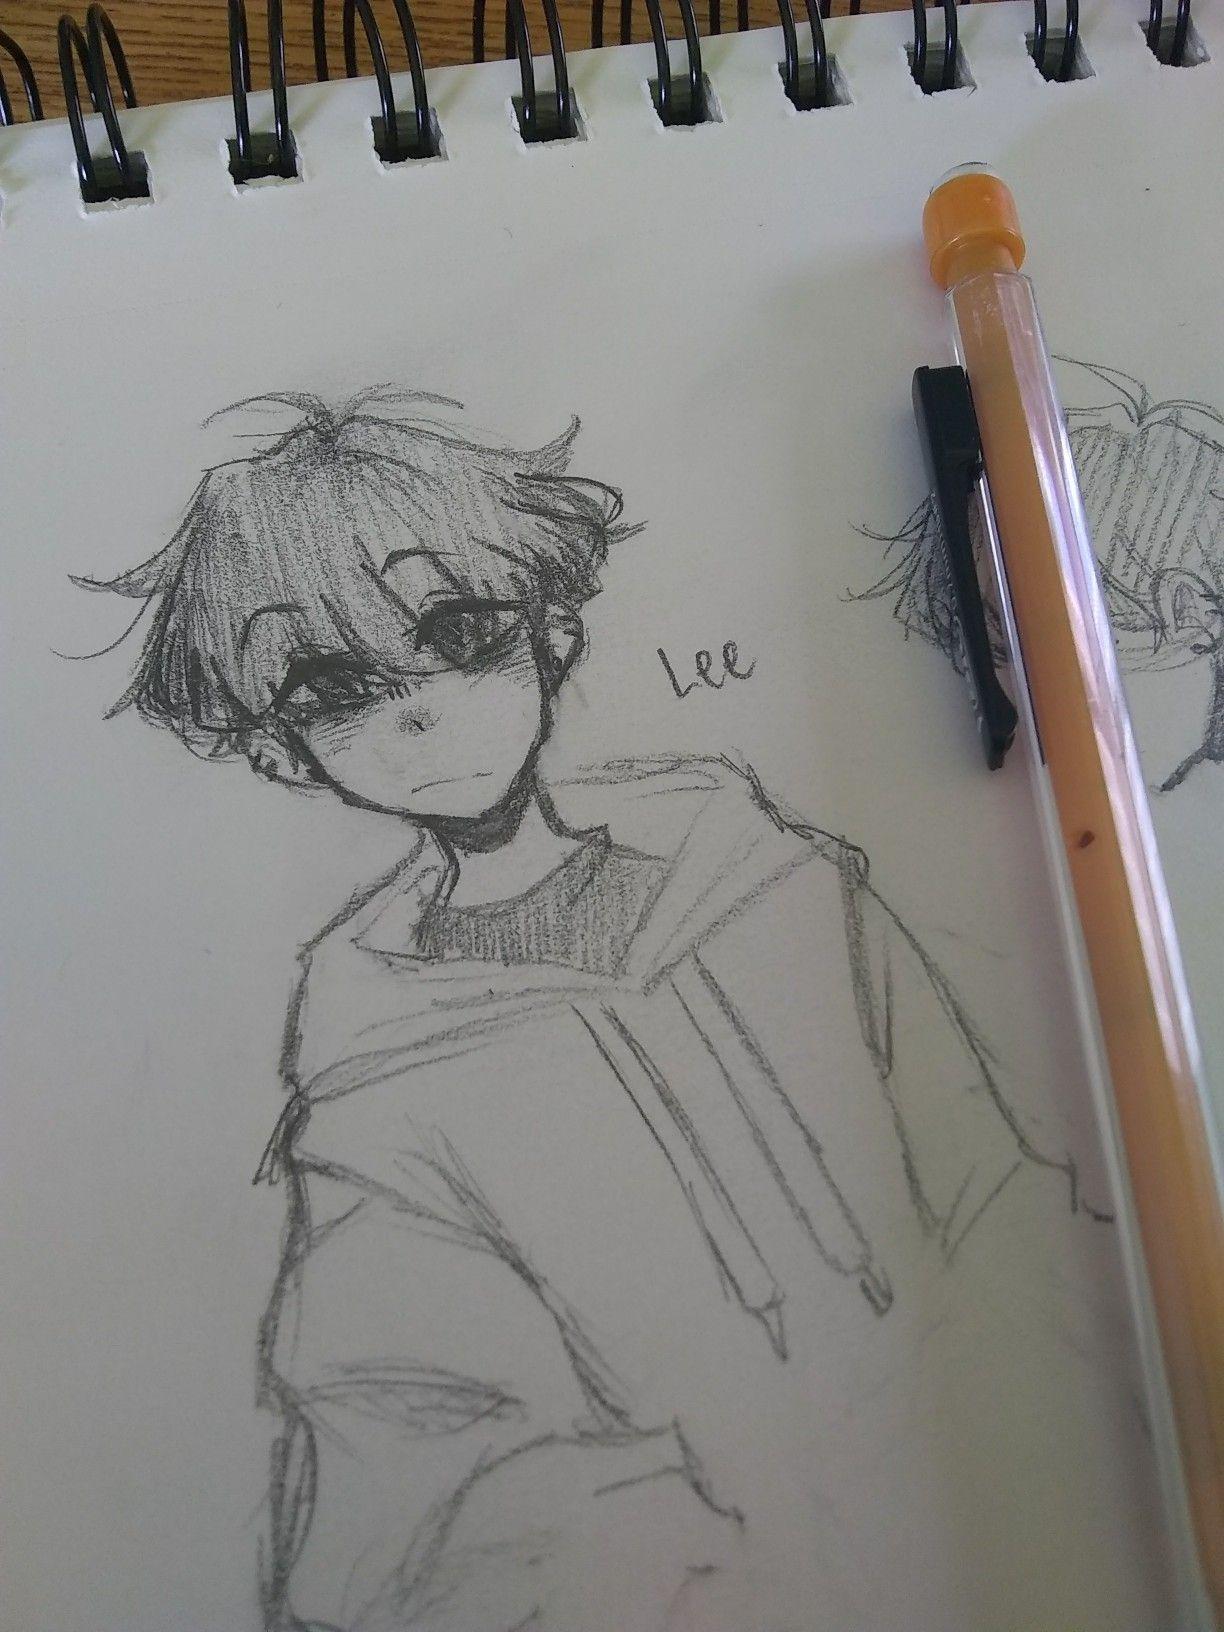 Anime Art Styles Drawing : anime, styles, drawing, Insta, Geebogigi), Cartoon, Styles,, Drawing, Tutorial,, Tutorials